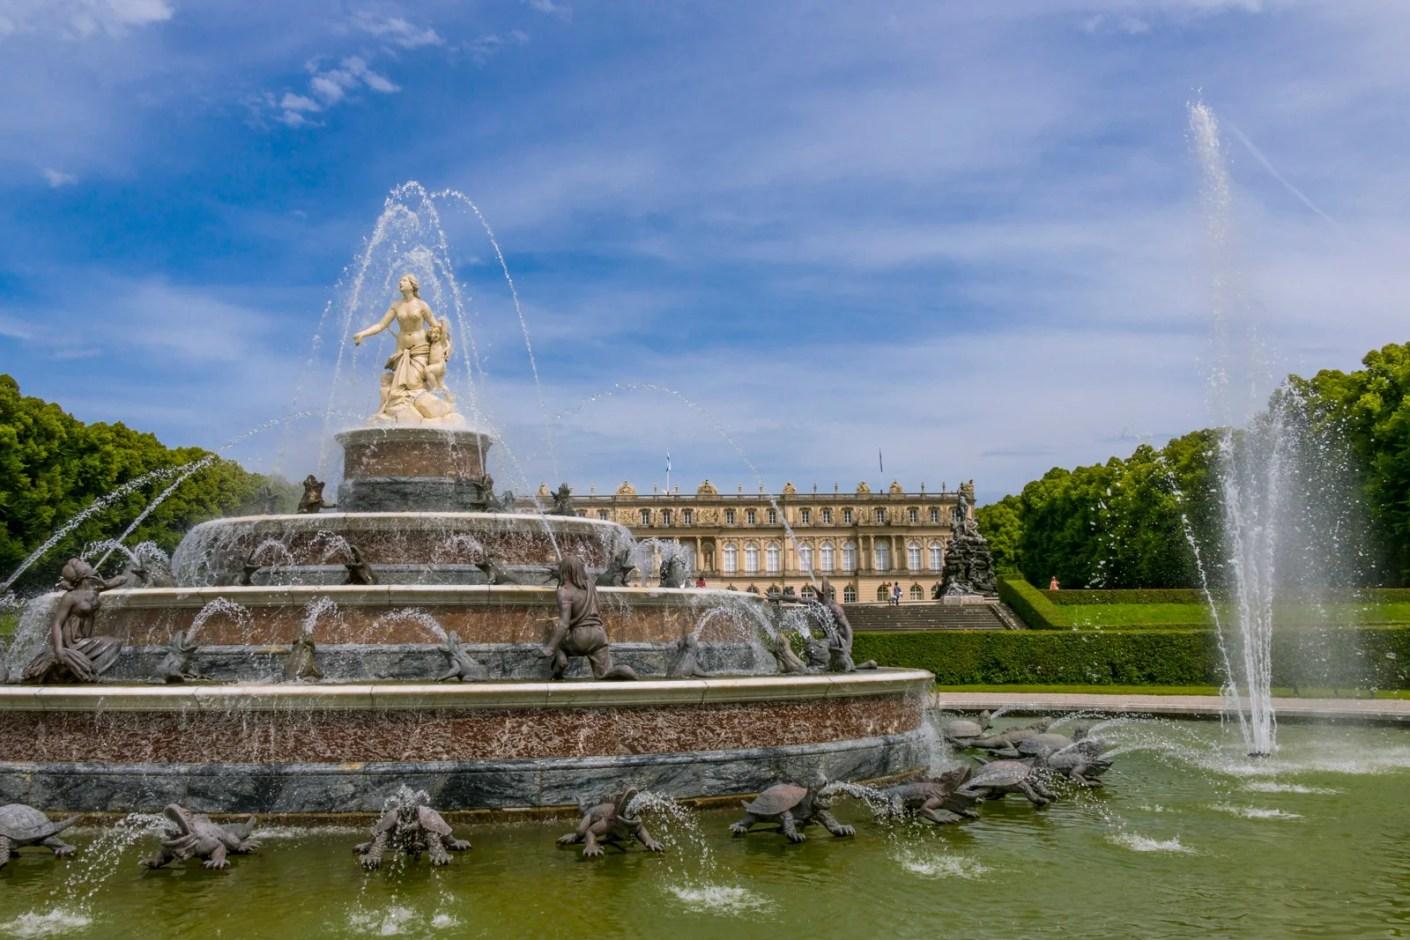 Latona Fountain, Herrenchiemsee Palace, Herreninsel. (Photo by footageclips / Shutterstock)